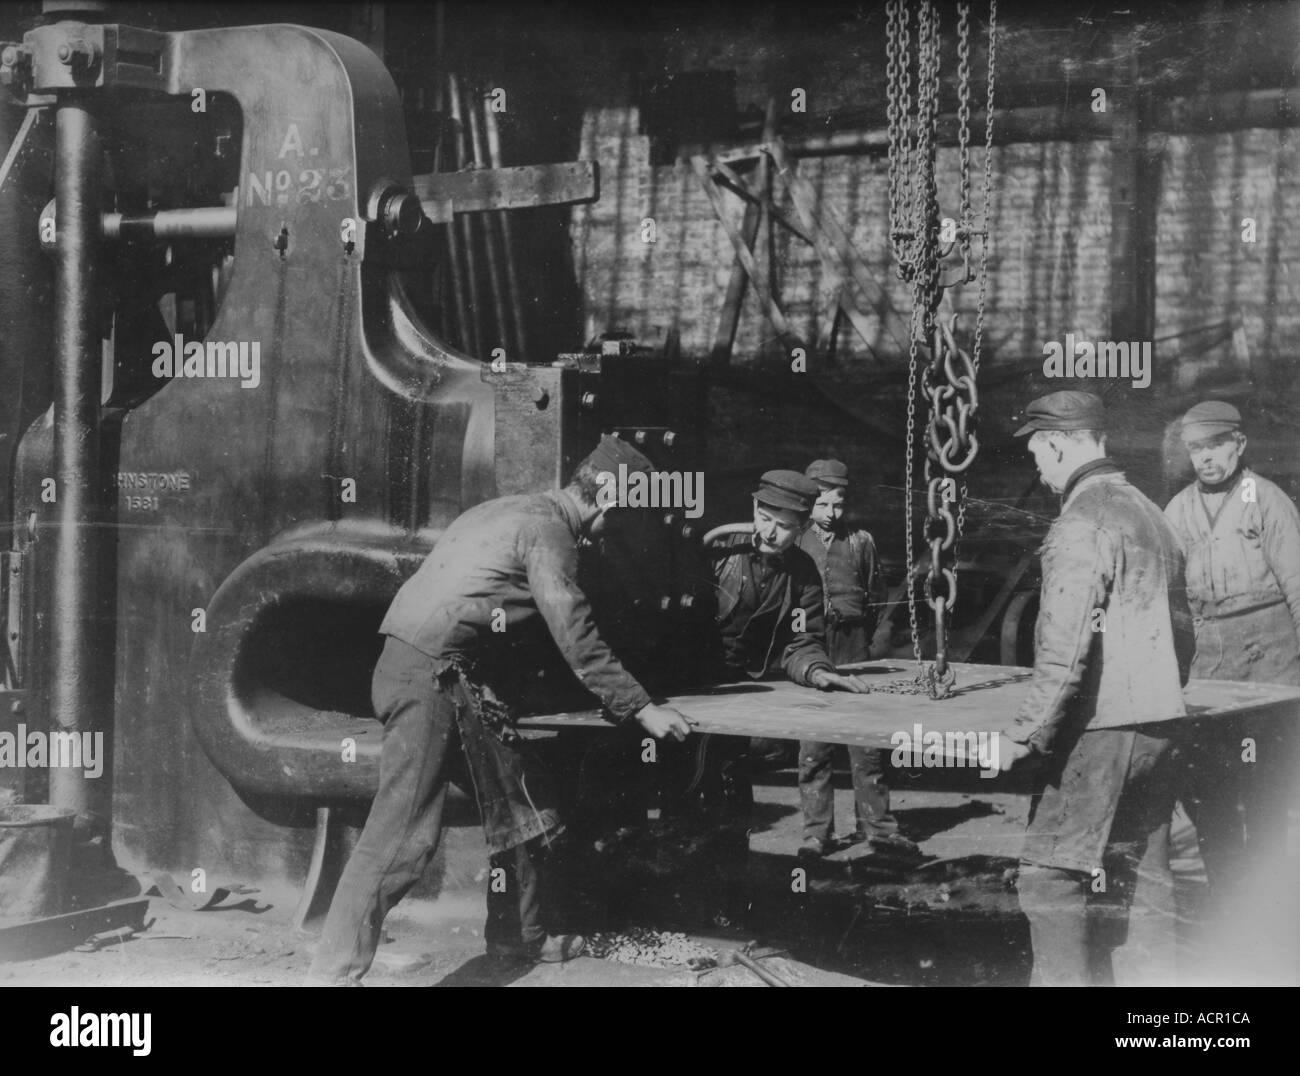 UK Scotland Greenock Shipyard Punching holes in sheet metal for rivits 1890 s - Stock Image